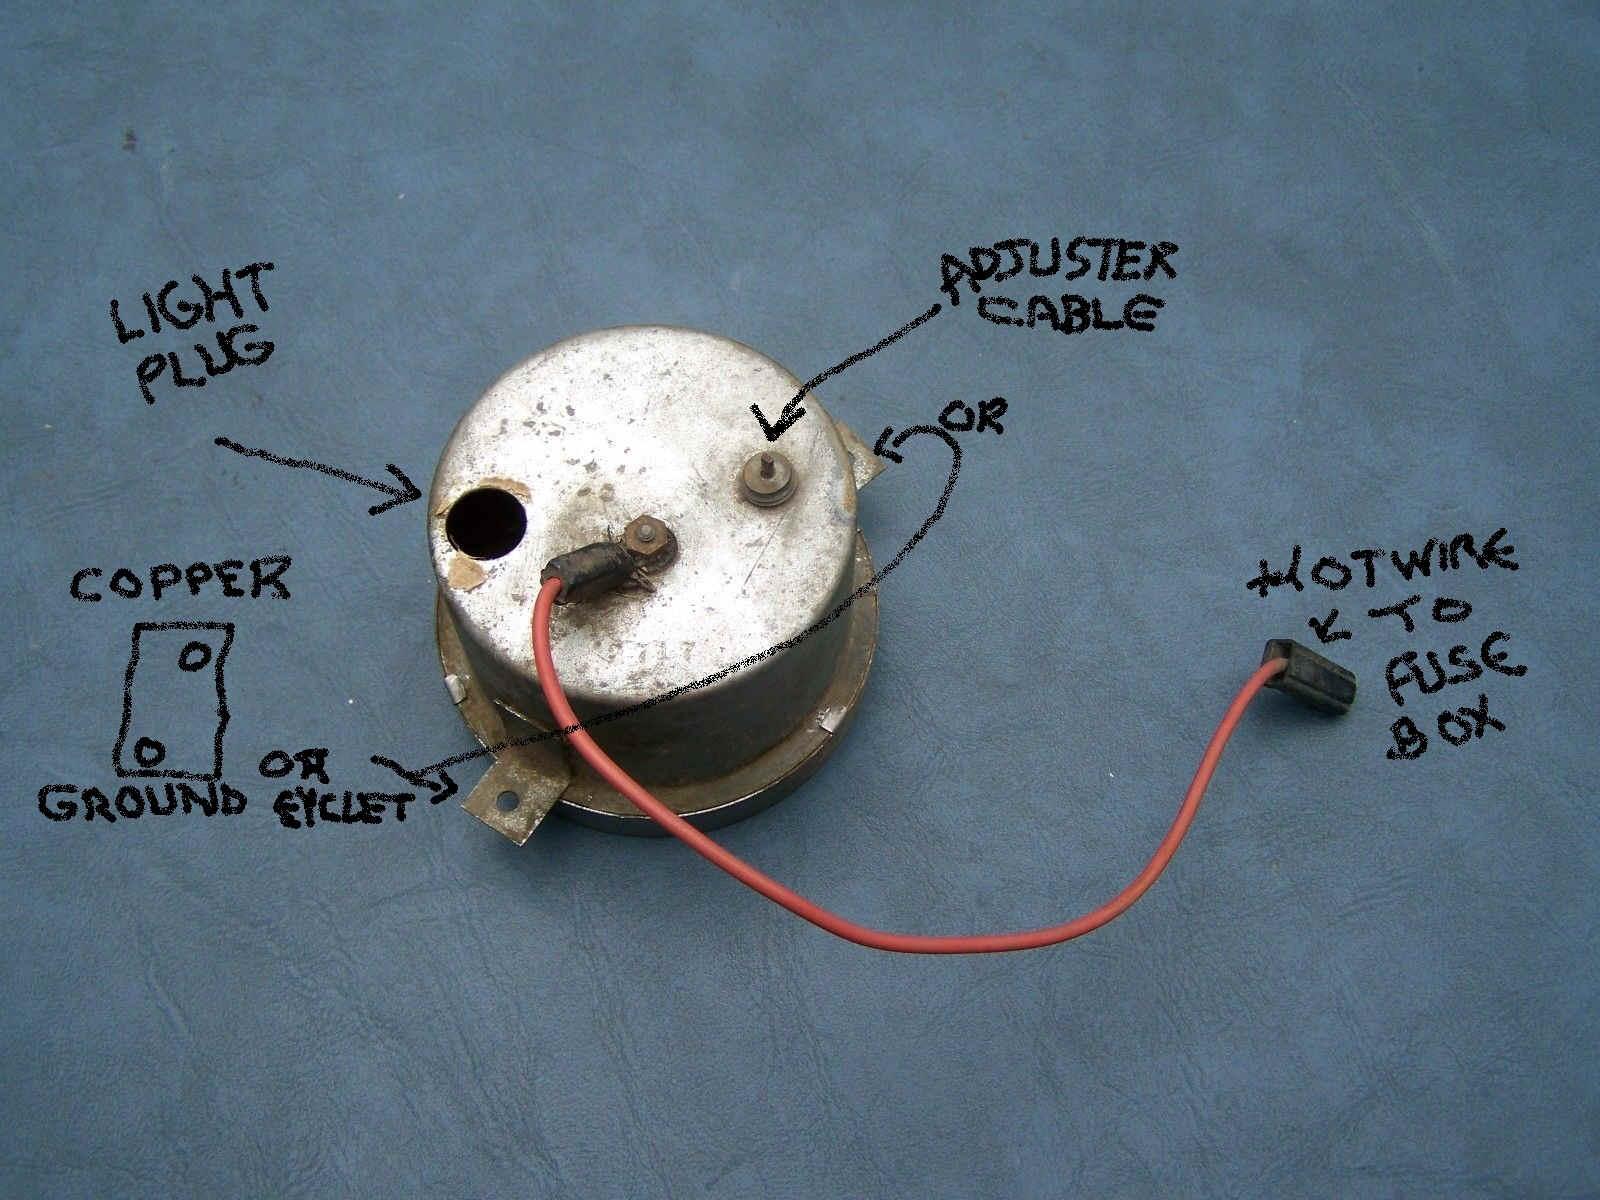 restore-your-amx-javelin  Amc Machine Wiring Diagram on 1971 amc machine, rambler rebel machine, 1967 amc machine, reble machine, custom amc rebel machine, rambler the machine, 1970 rambler machine, 1970 american motors rebel machine,